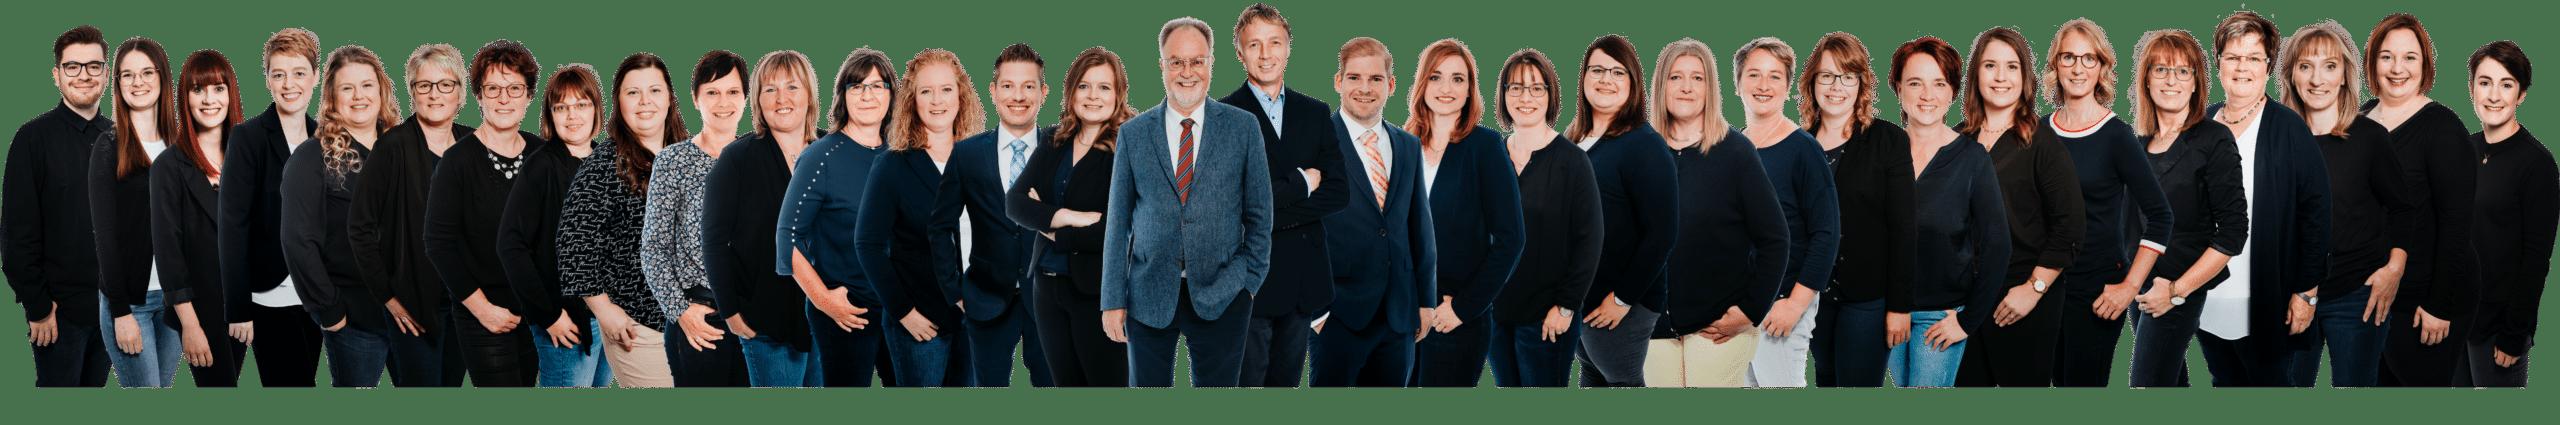 Löffler Steuerberatung Team